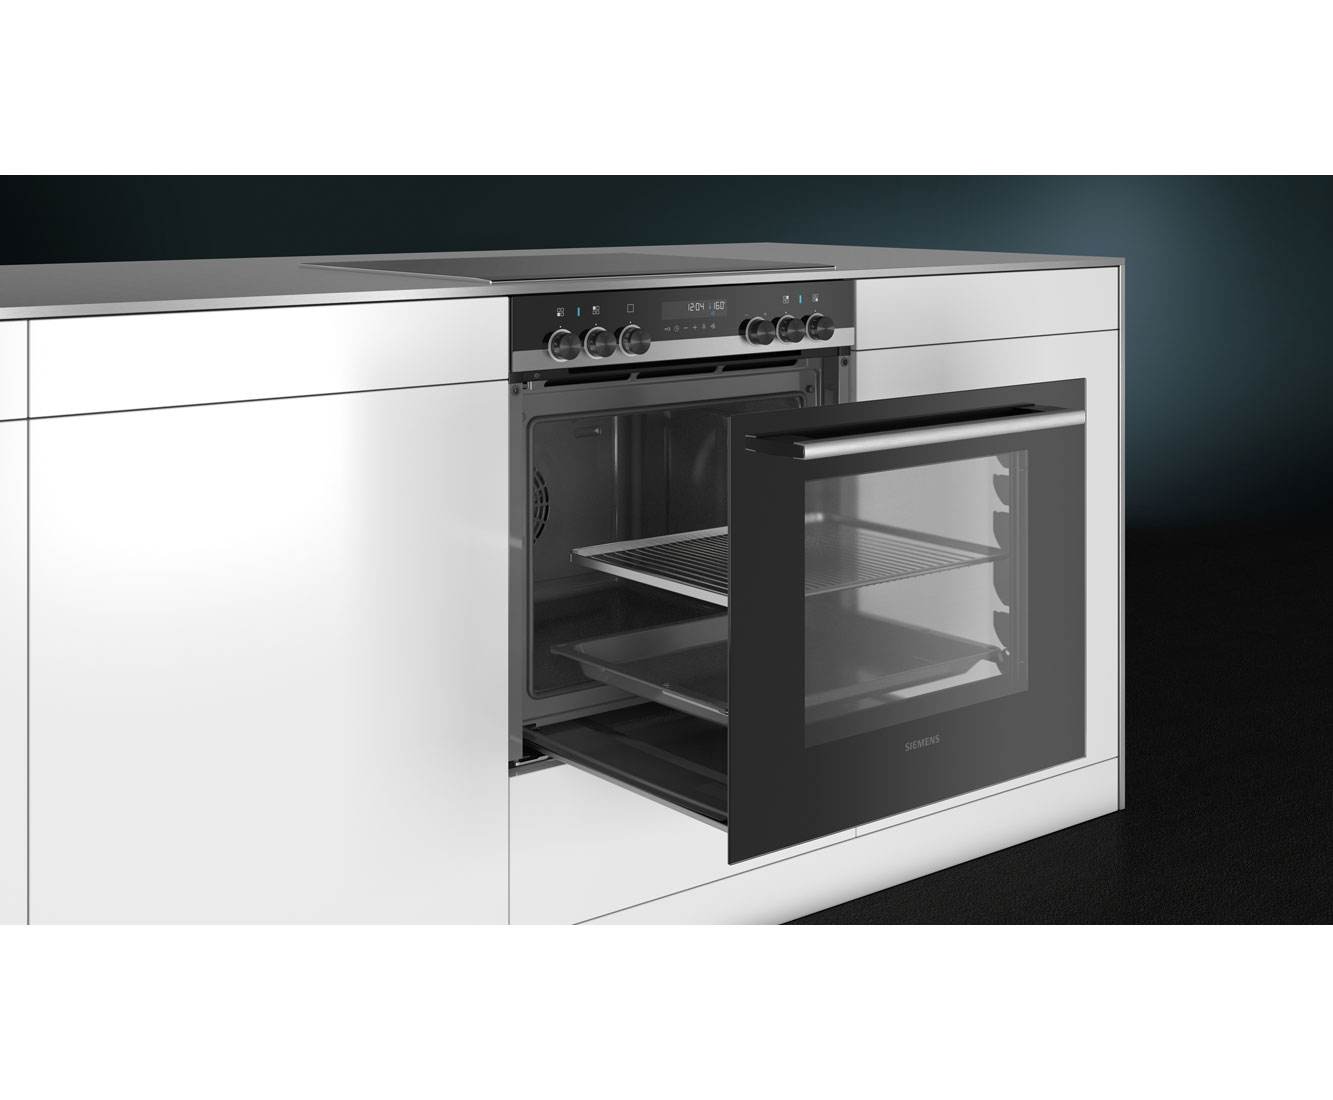 Siemens Pq521kb00 Einbauherd Set Mit Glaskeramik Kochfeld Edelstahl